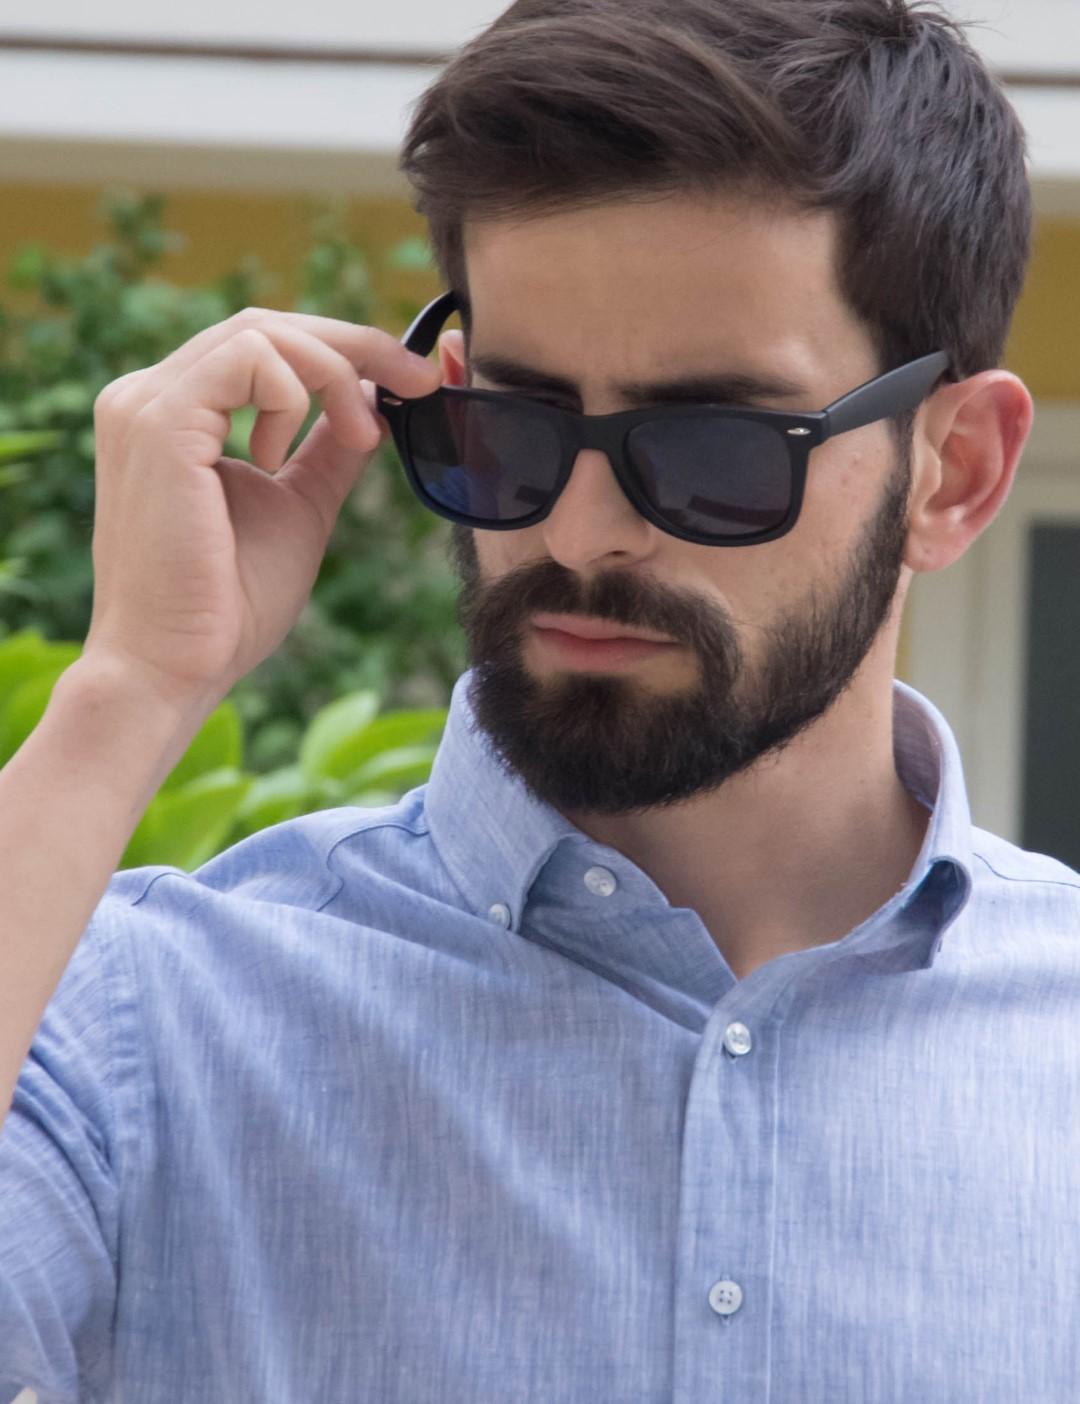 f9cb55a63a Ανδρικά γυαλιά ηλίου ρετρό μαύρα luxury S9125